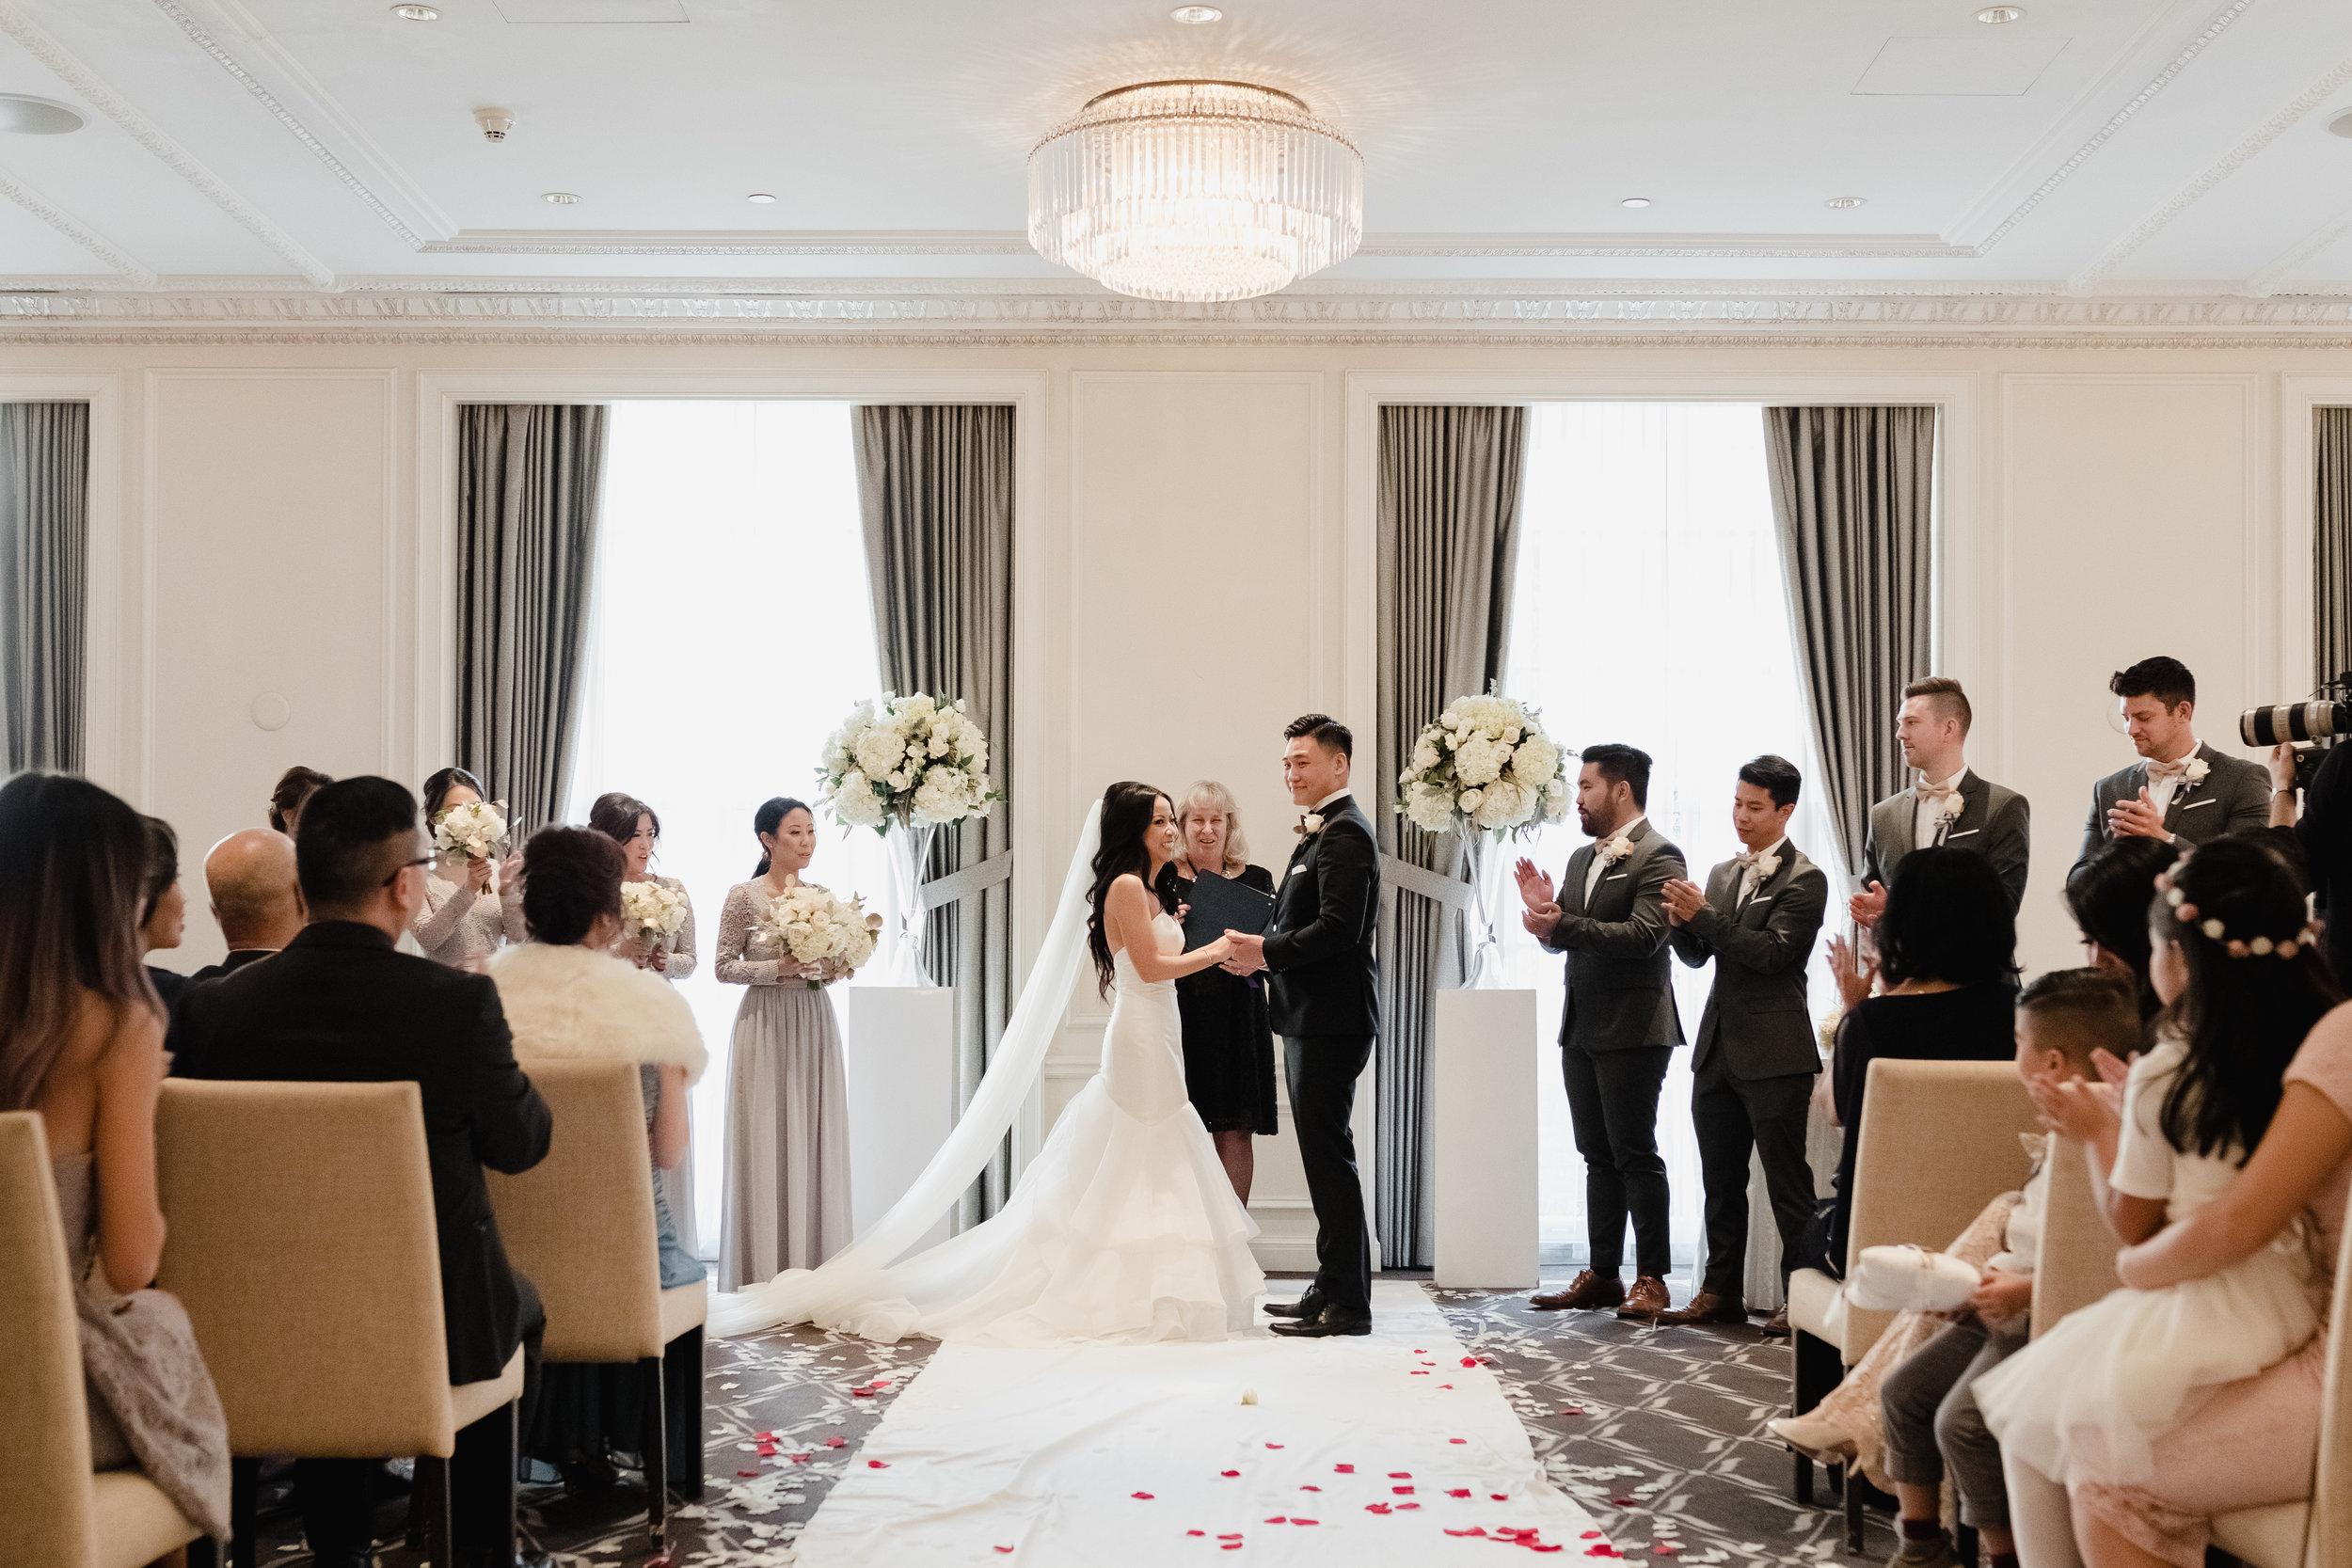 HeraStudios_Selects_Full_KatrinaAndrew_Wedding_Version2-369.jpg